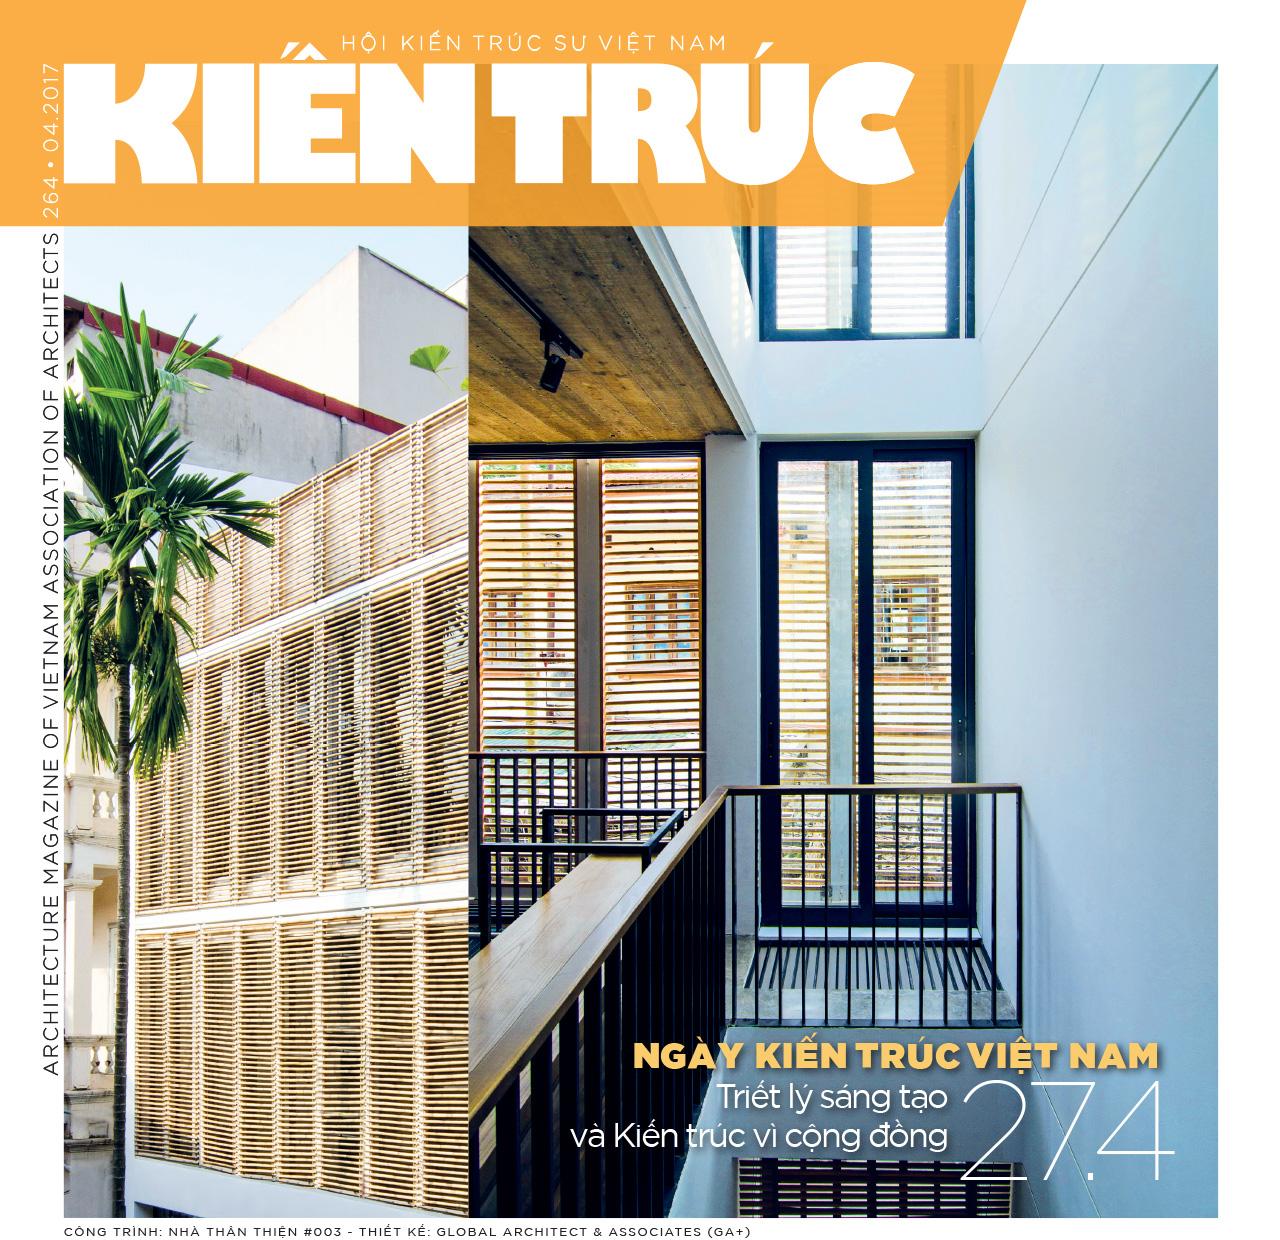 Tạp chí Kiến trúc số 04-2017